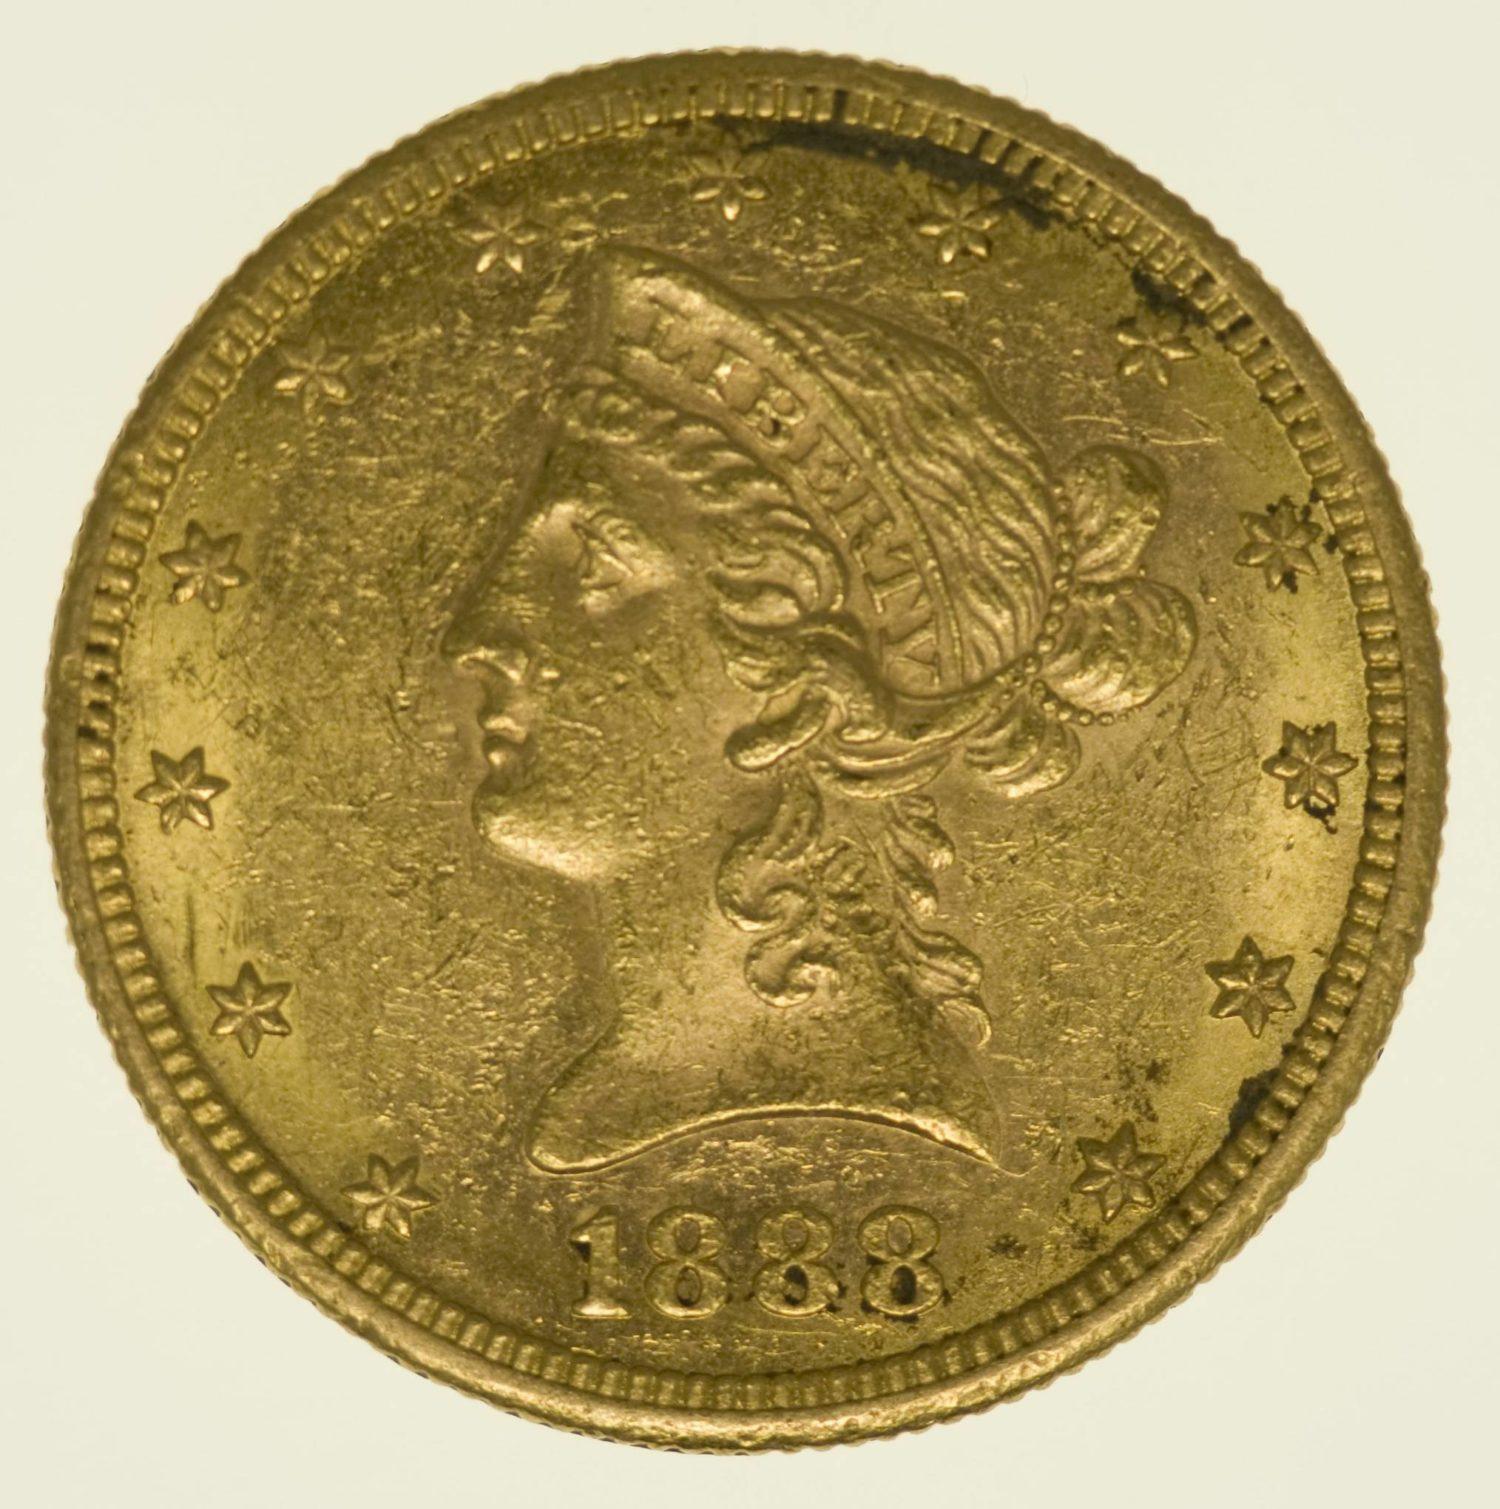 USA 10 Dollars 1888 Liberty / Kopf Gold 15,05 Gramm fein RAR